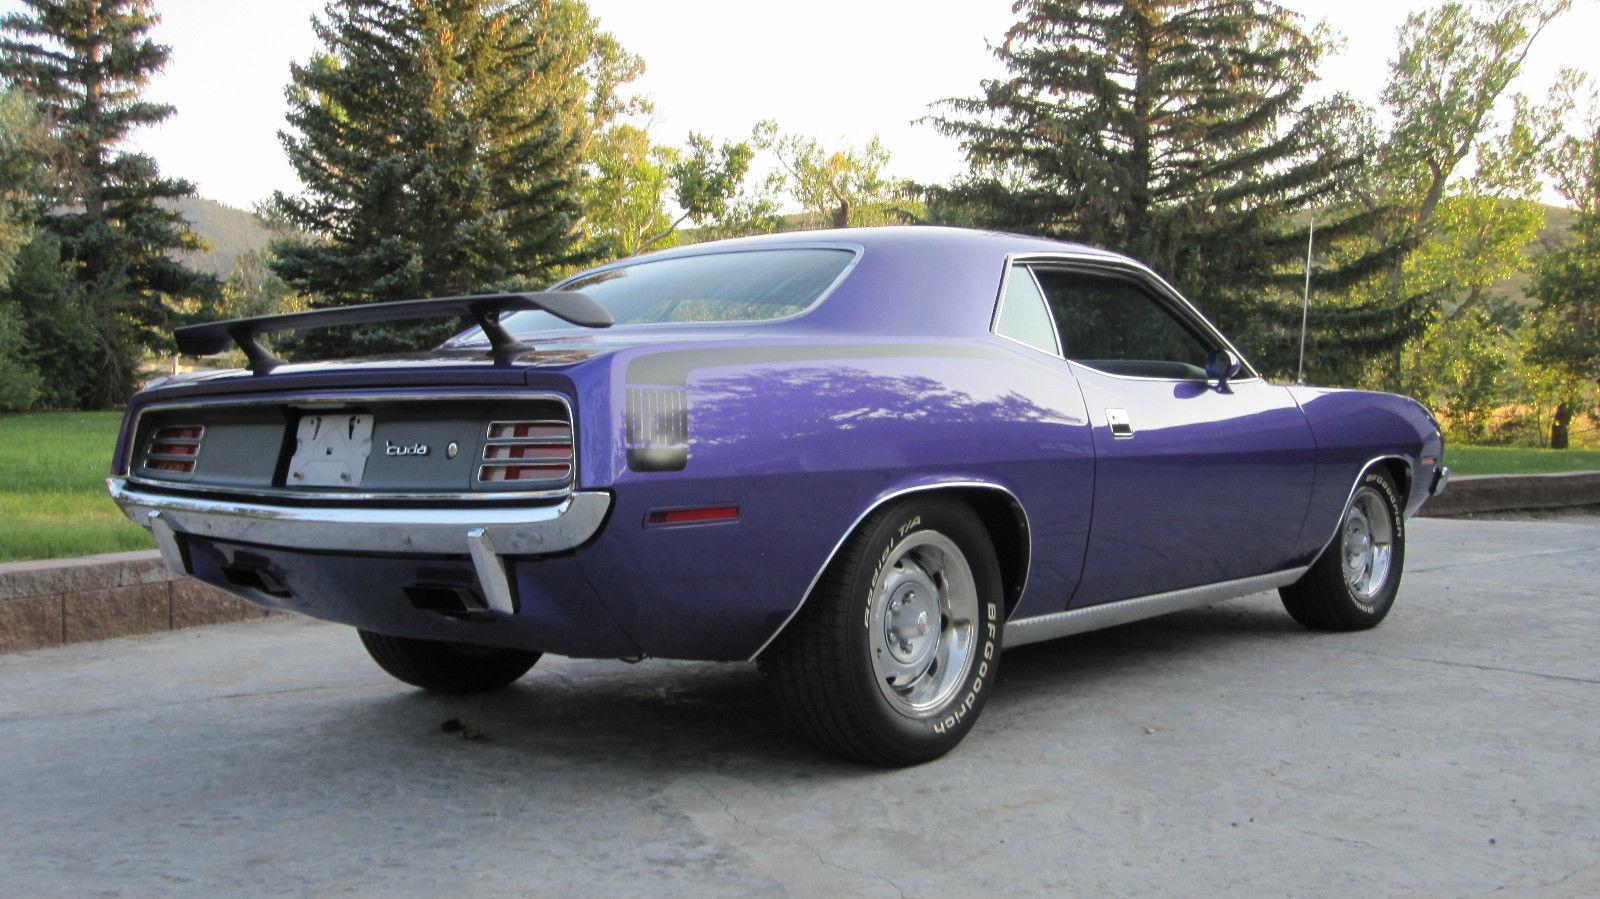 1970 Cuda 426 Hemi 4 Spd Dana 60 Tribute Plum Crazy Purple